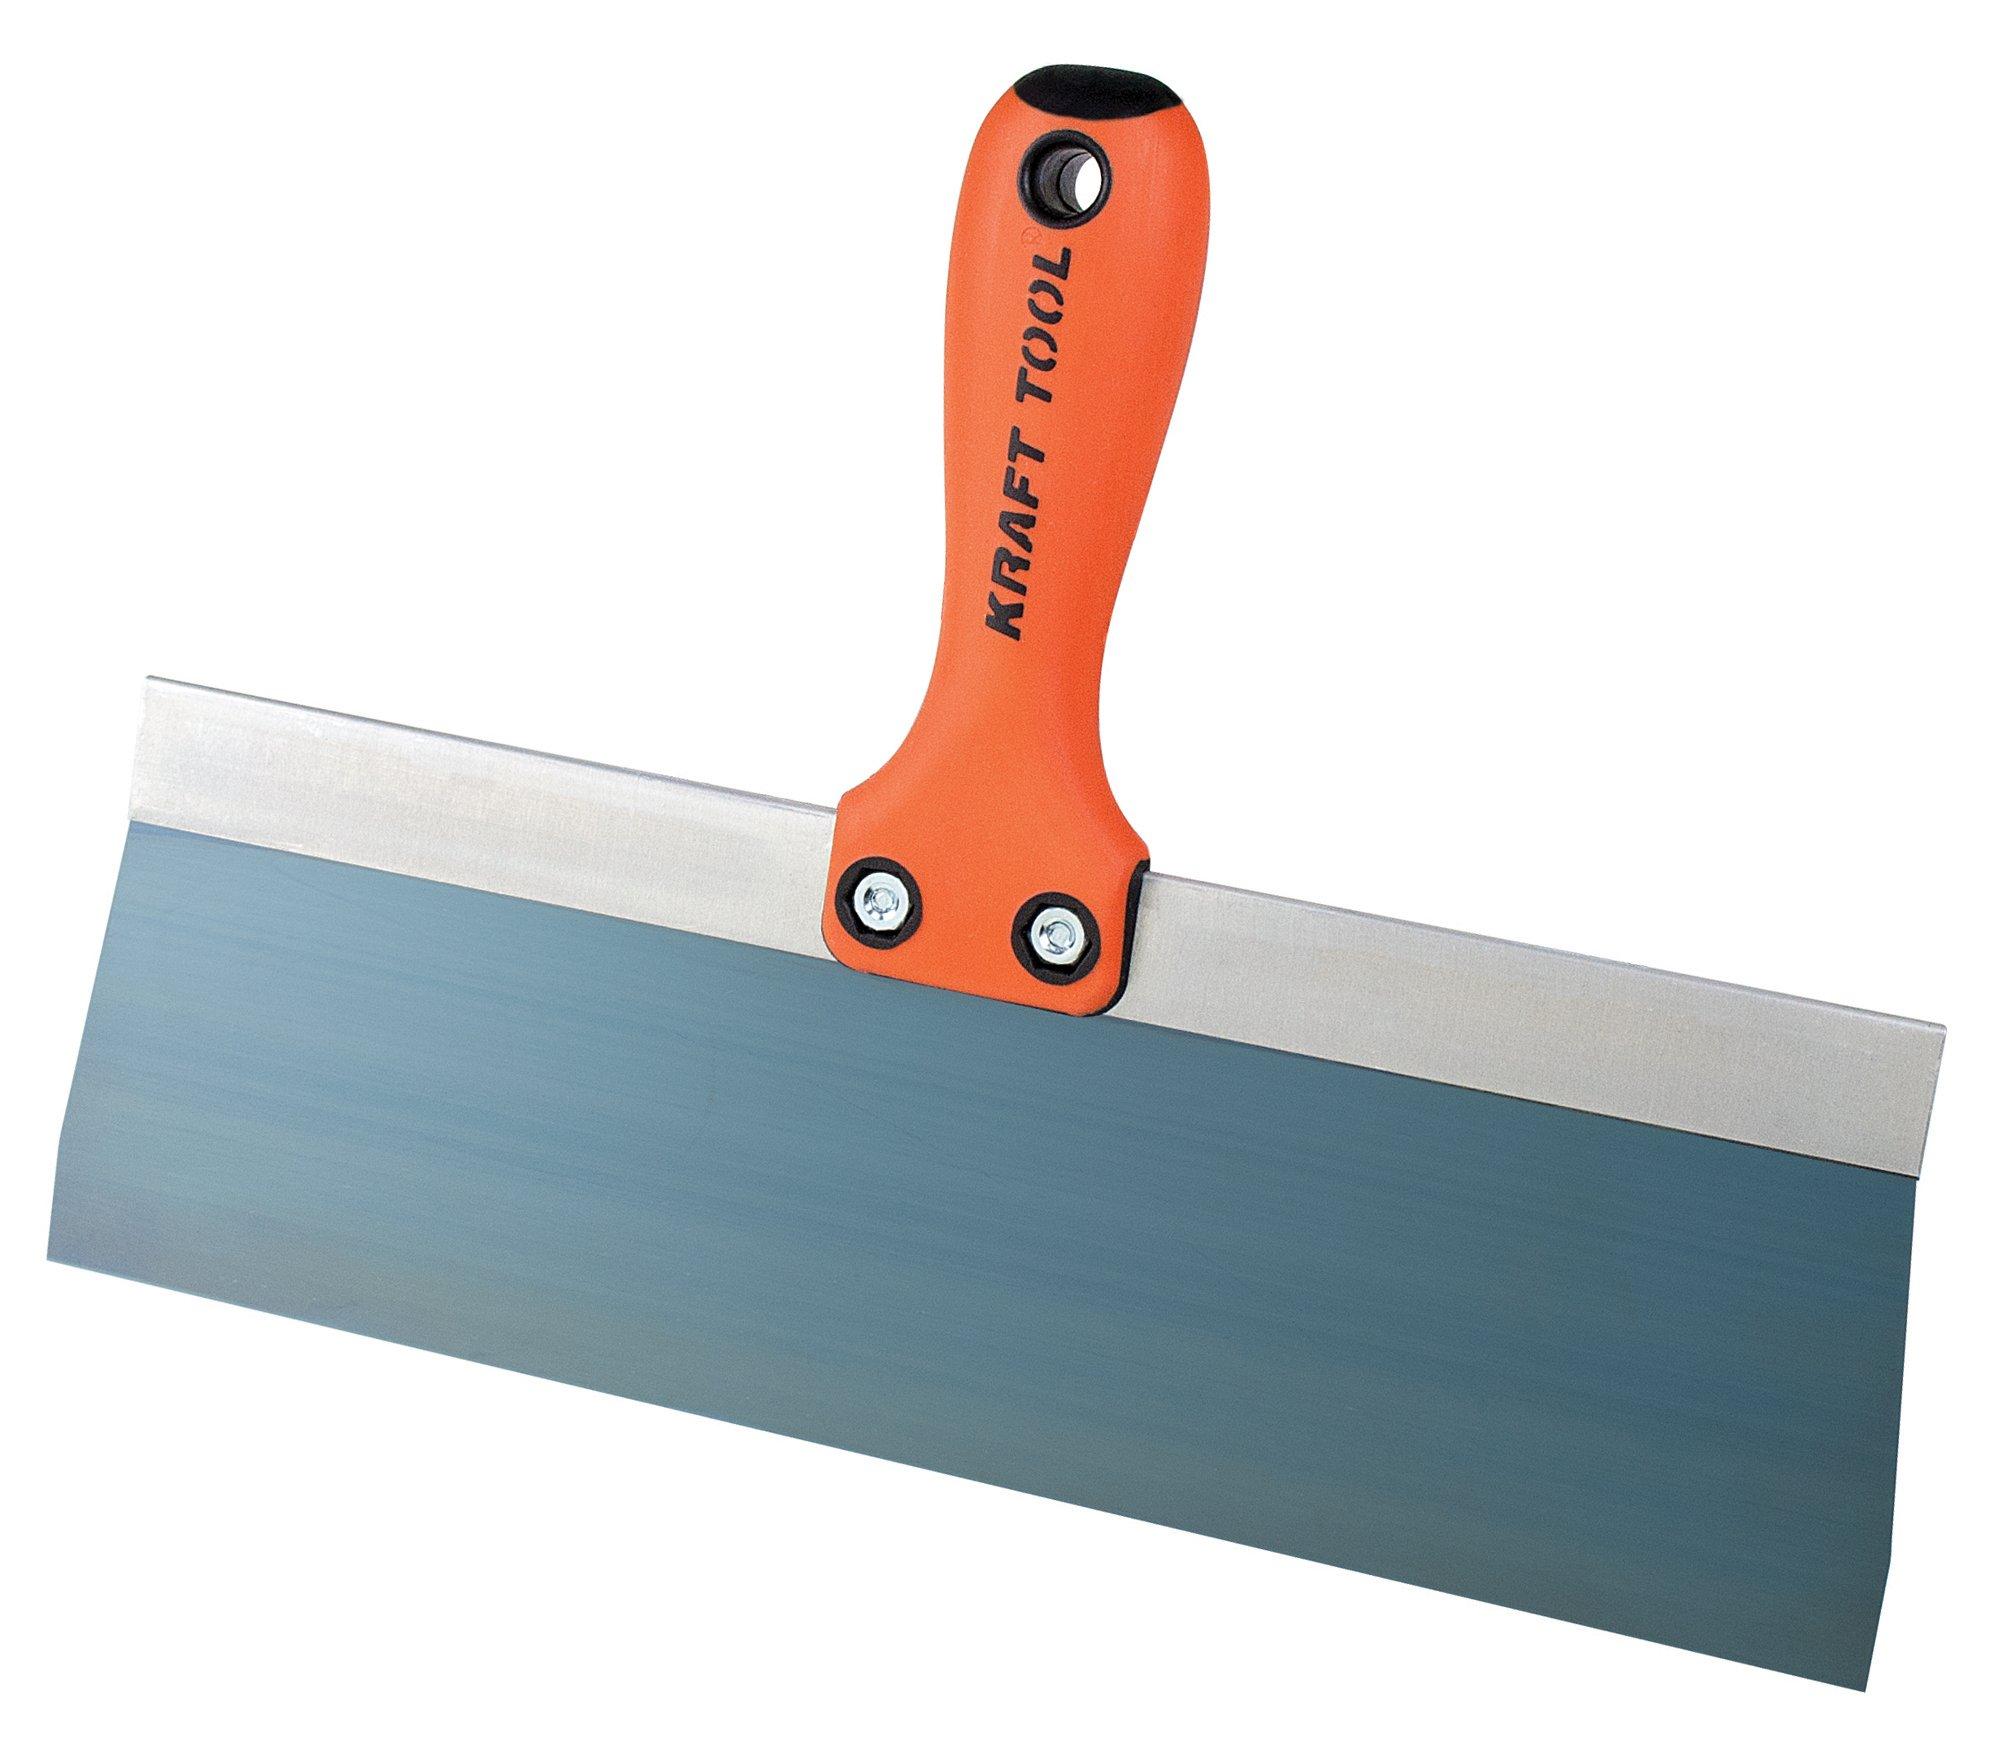 Kraft Tool DW812PF Standard Taping Knife with Preform Soft Grip Handle, 12-Inch x 3-Inch, Orange